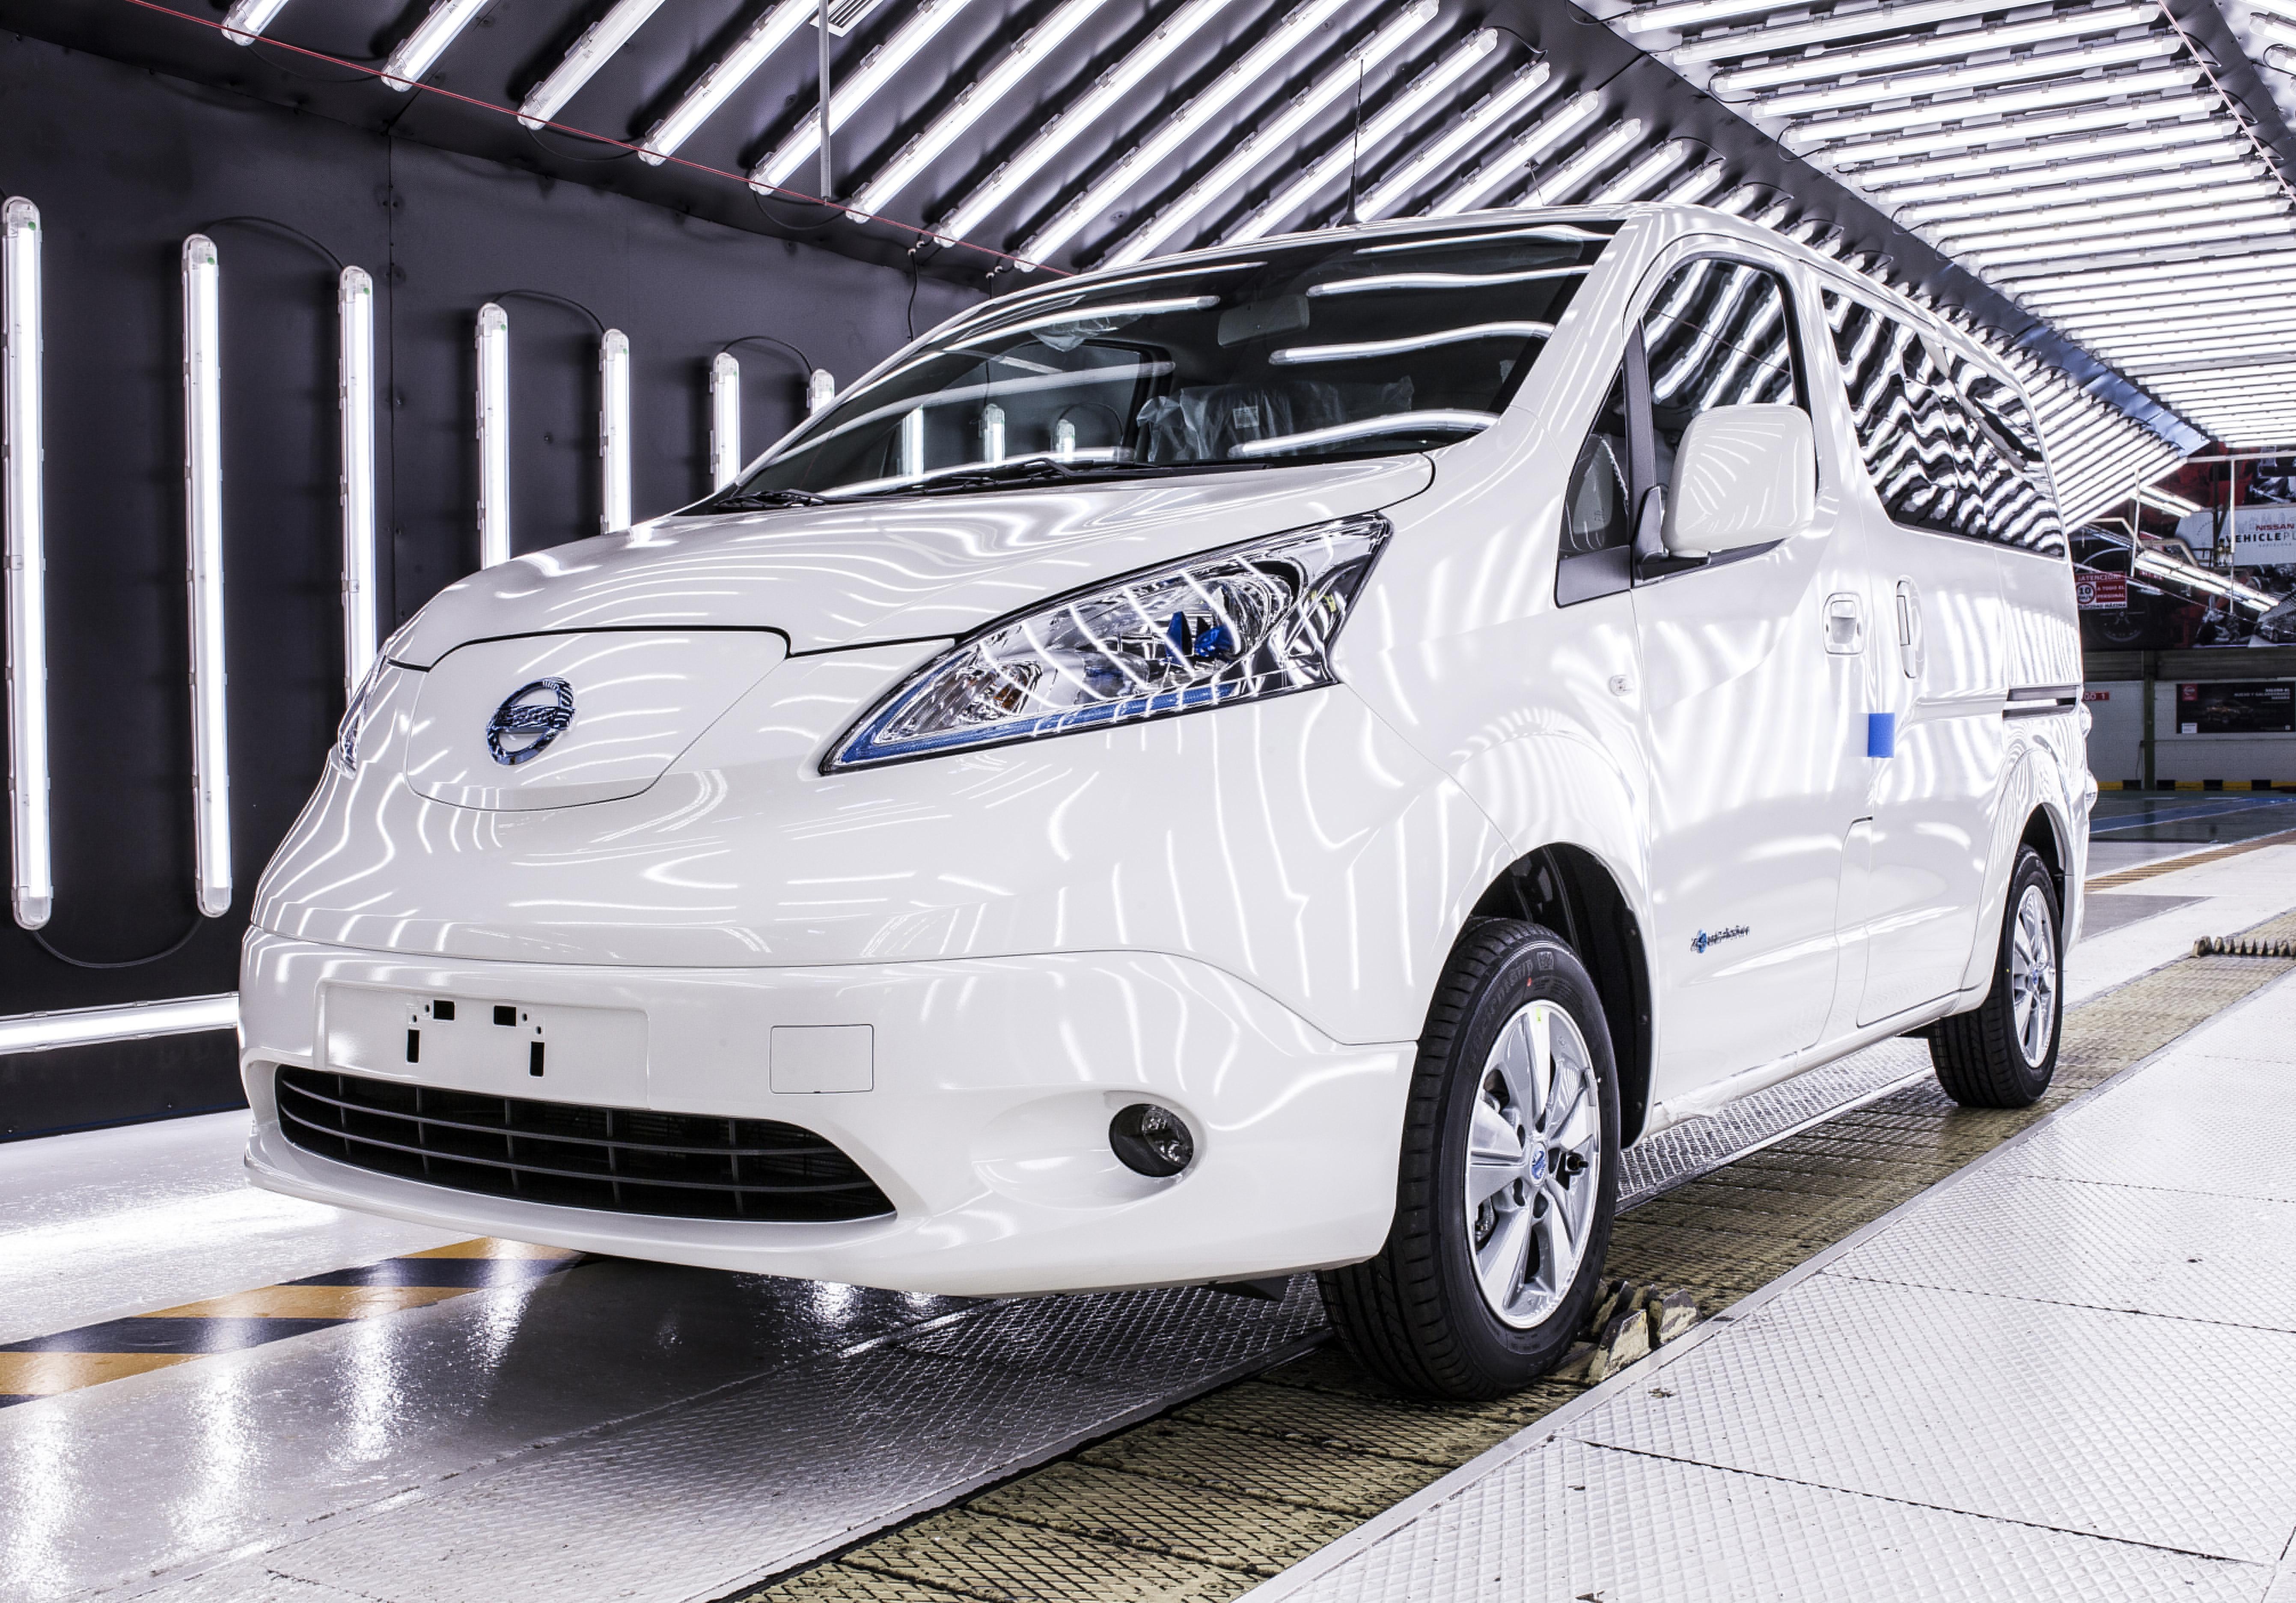 Schema Elettrico Nissan Cabstar : Impianto elettrico nissan atleon vehicle manager